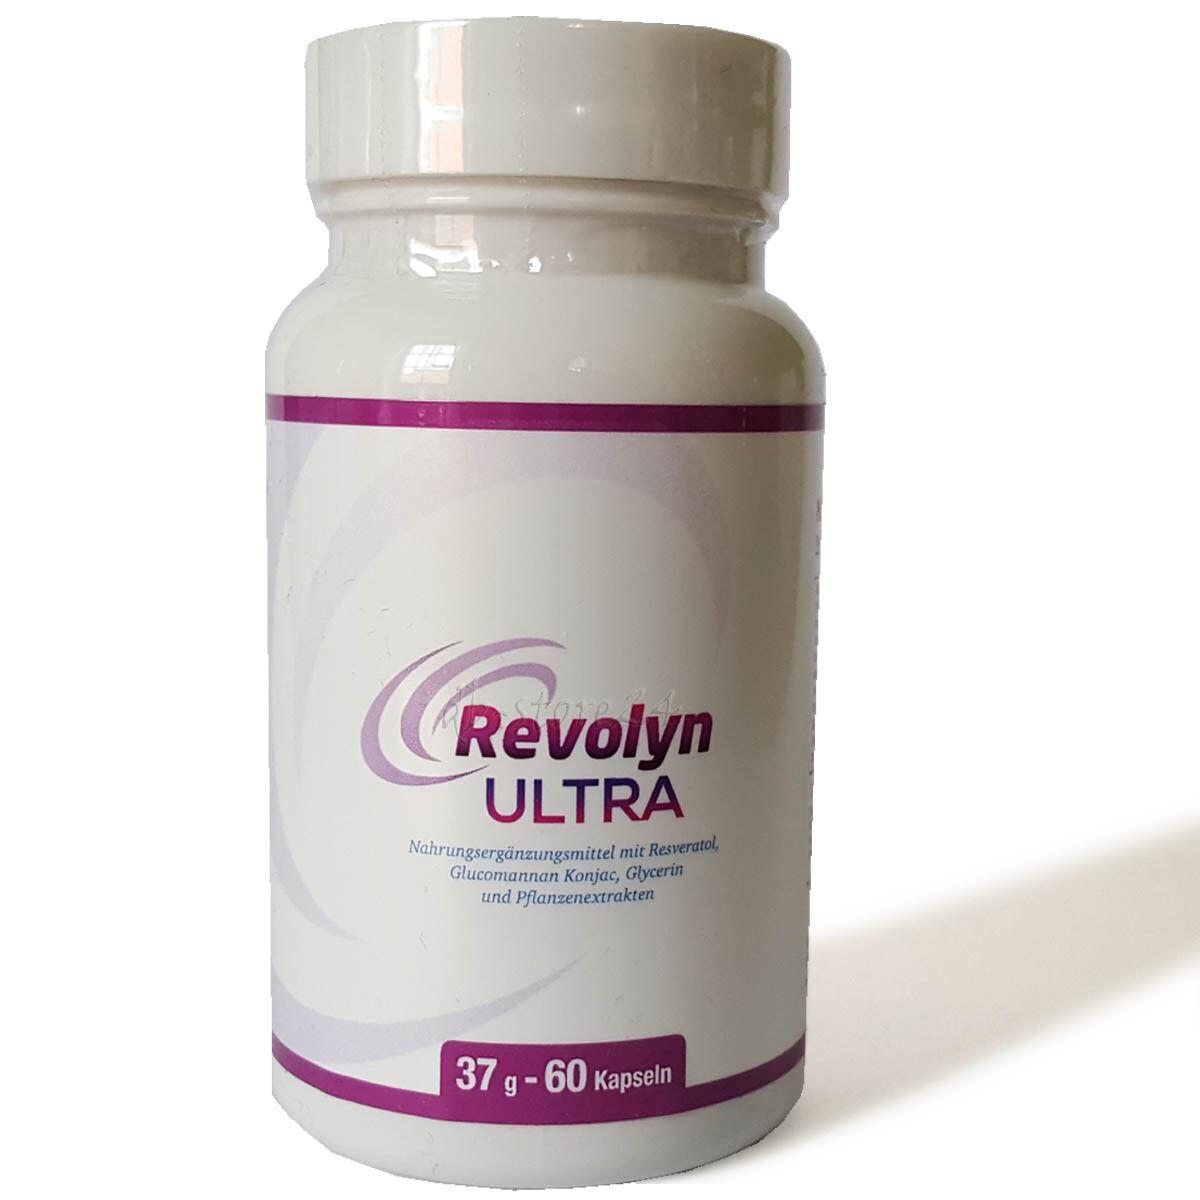 Revolyn Ultra Fettverbrennung Diät Gewichtsreduzierung 100% ORIGINAL